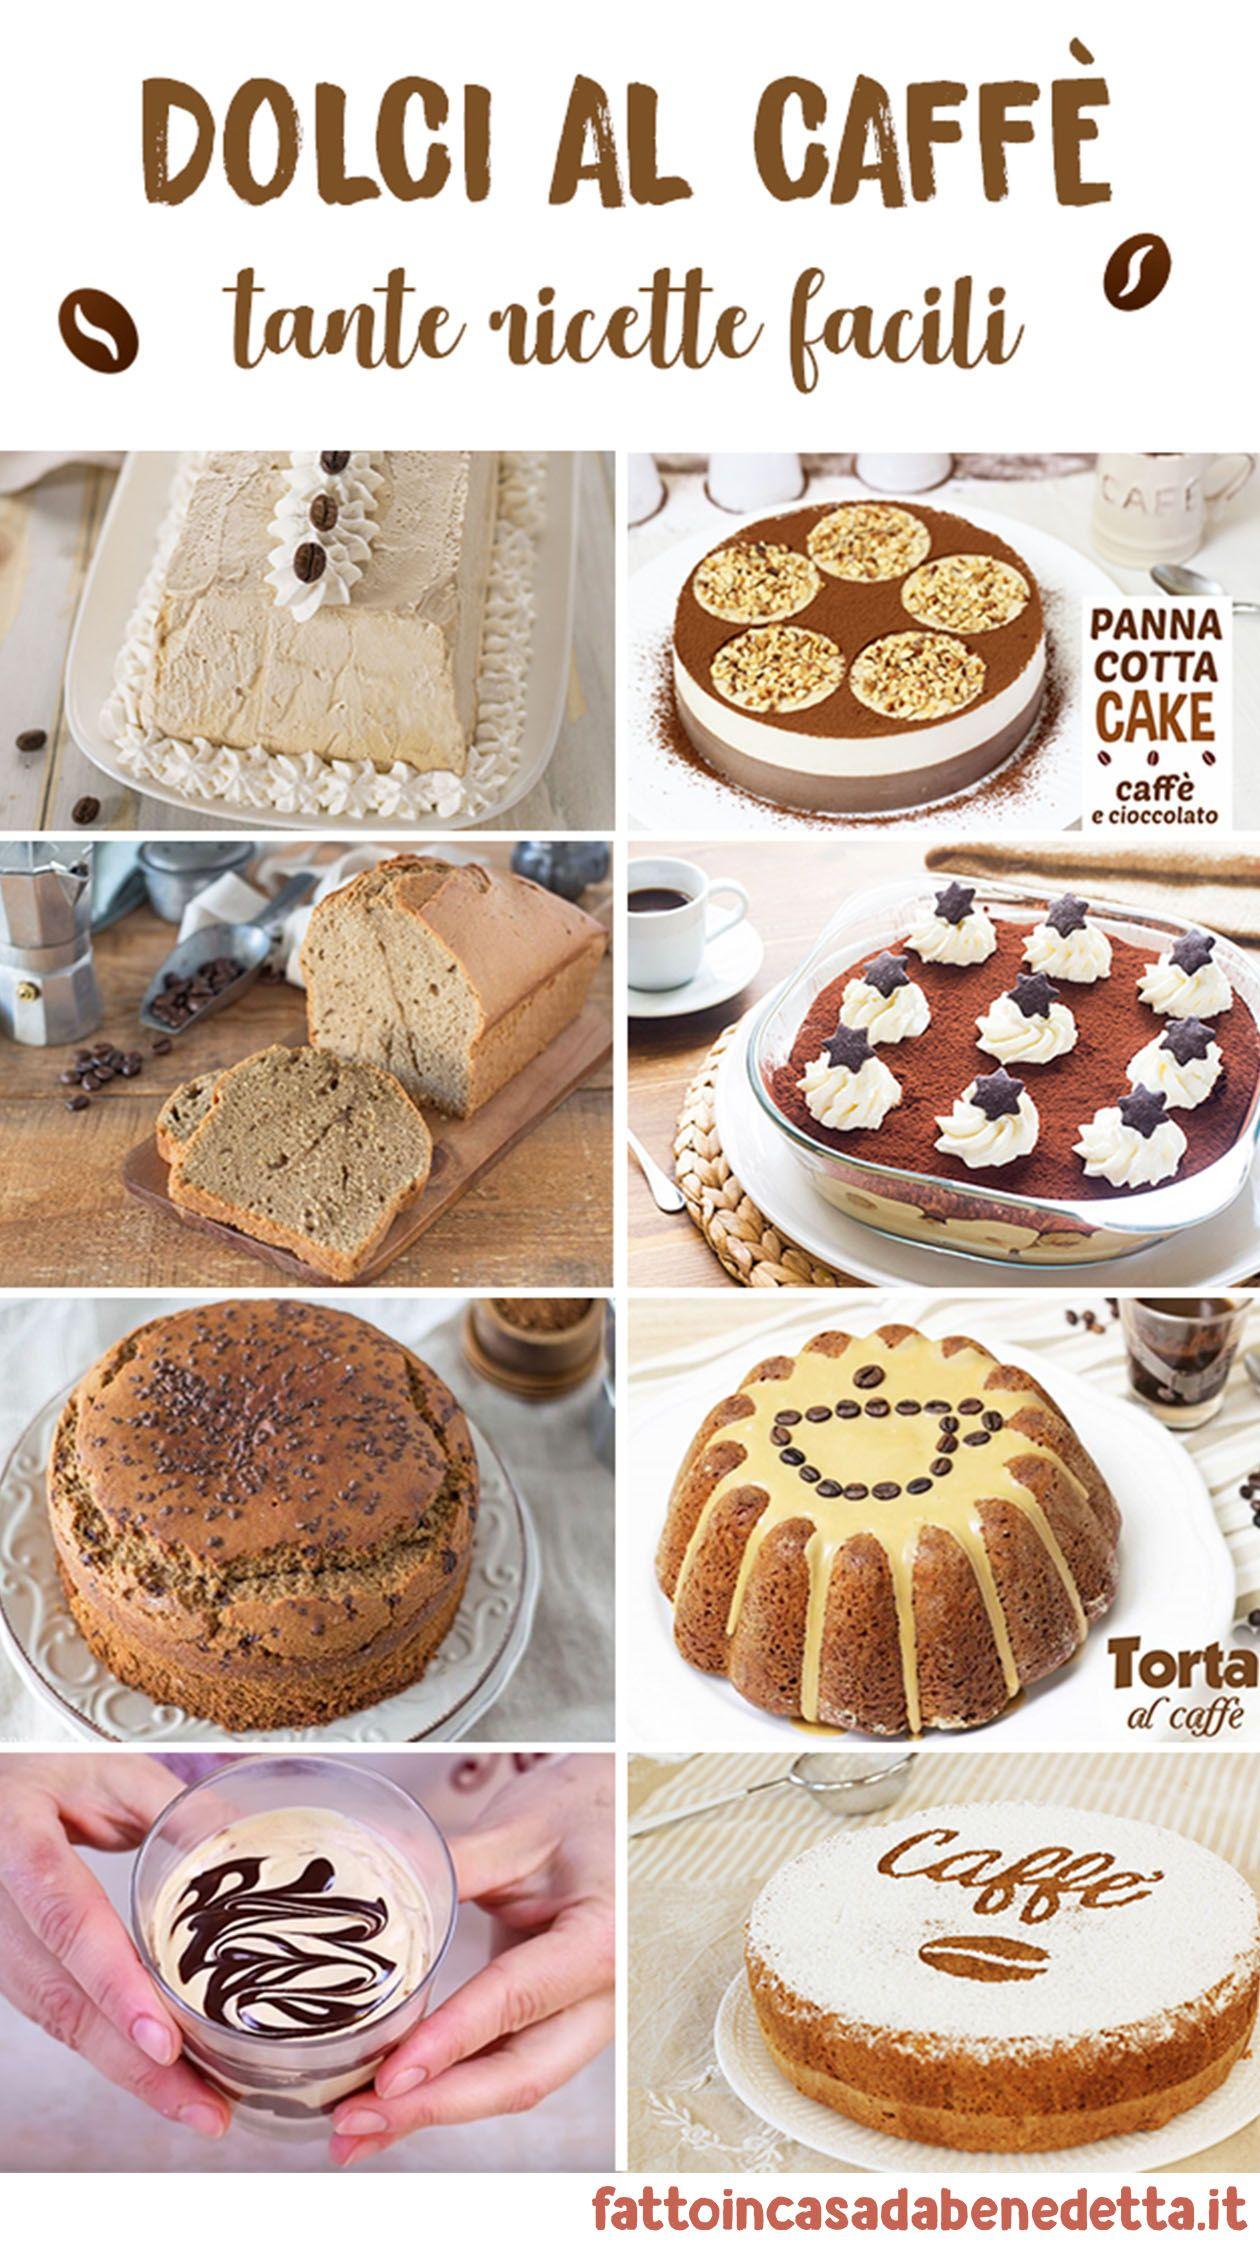 Raccolta di dolci al caffè di Benedetta! Tantissime ricette diverse  perfette per tutte le occasioni torte fredde, ciambelloni soffici, gelati  e biscotti